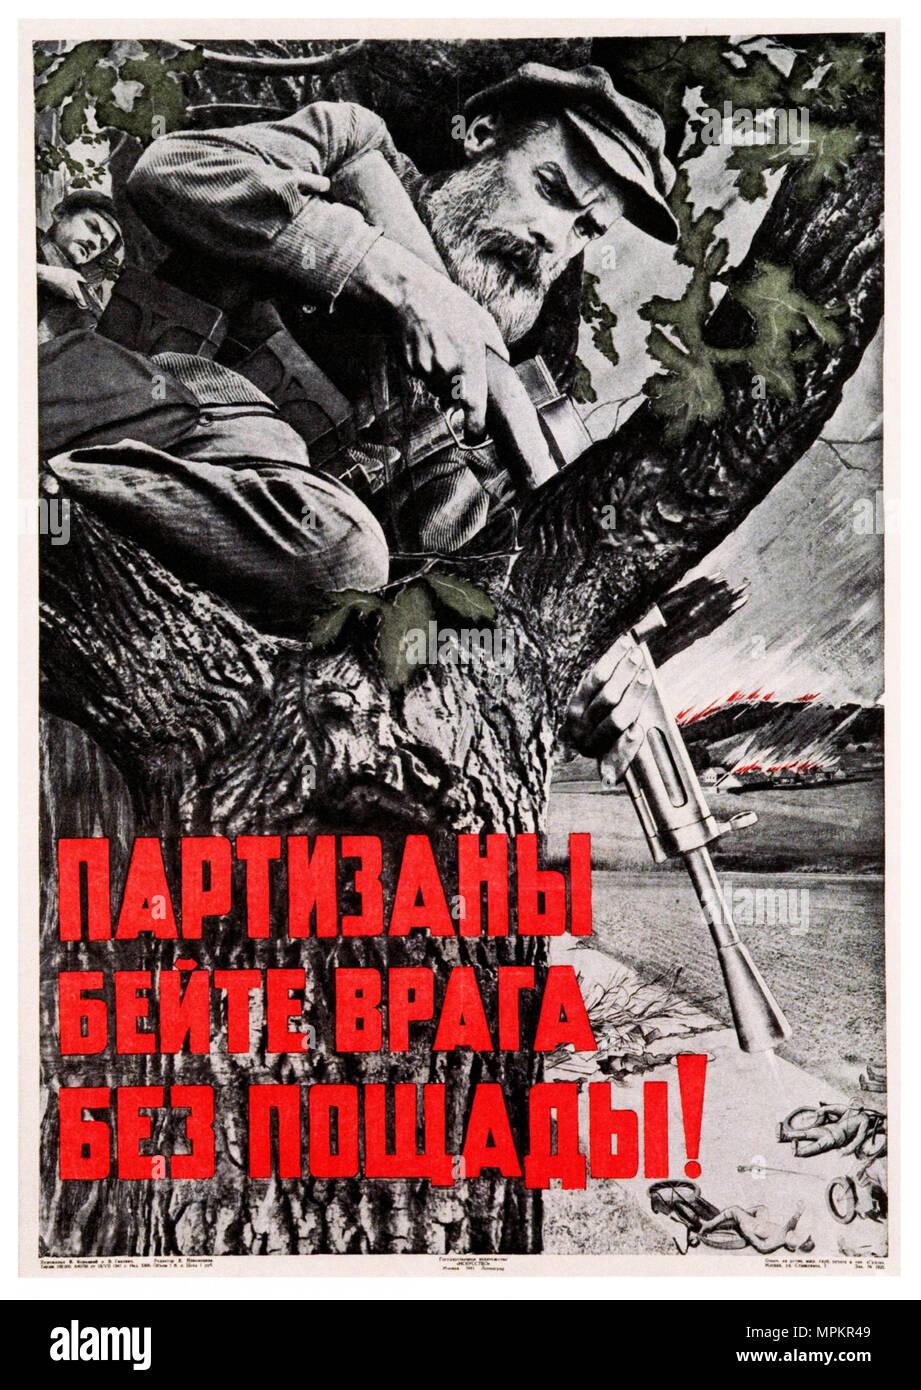 USSR Vintage Propaganda Poster - Partisans, Batter the Enemies Mercilessly - Stock Image